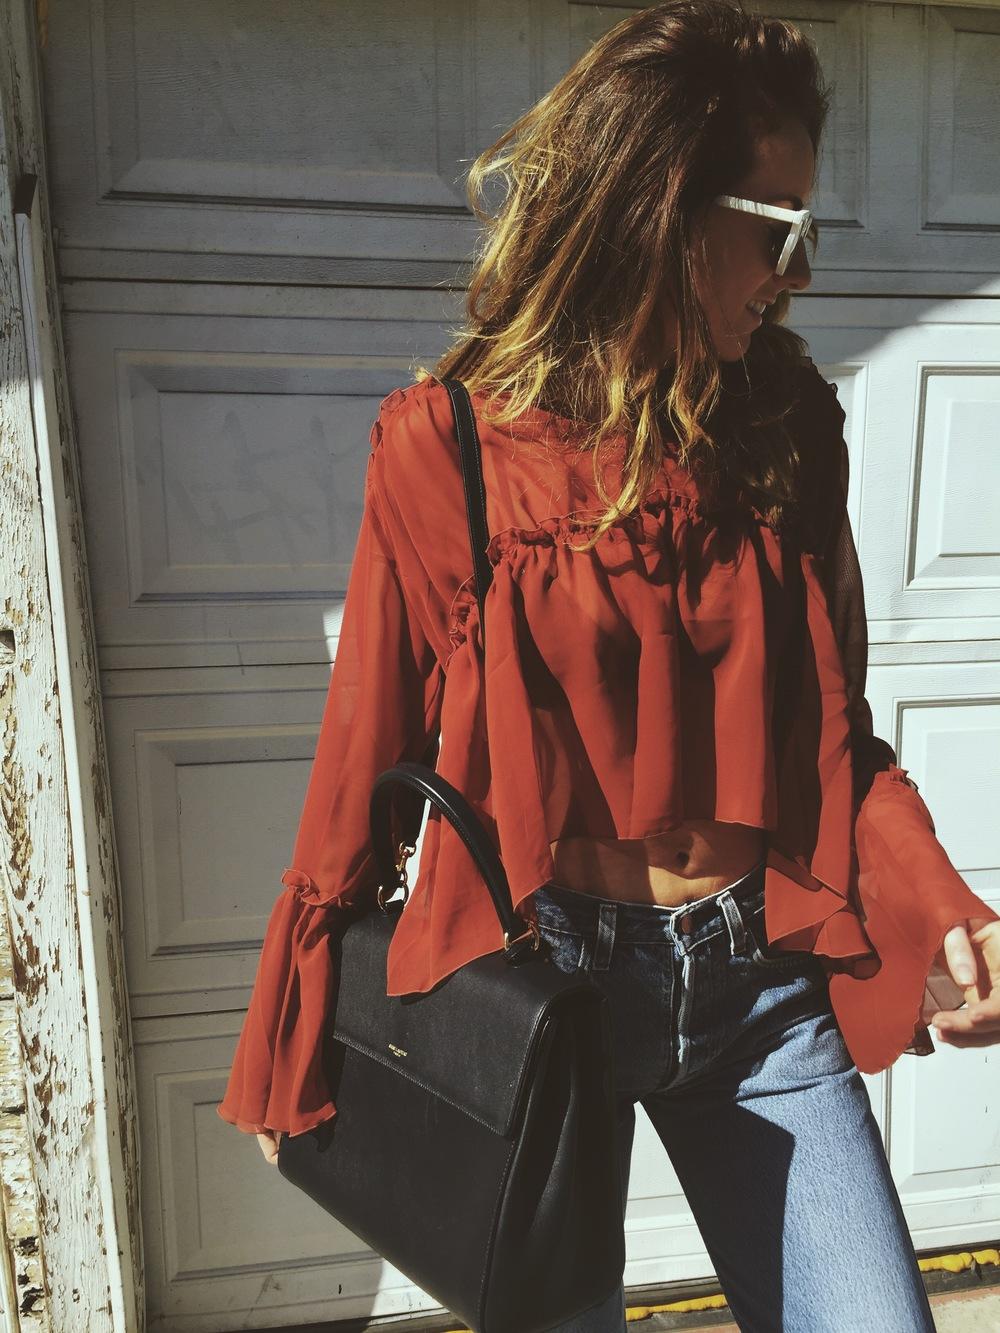 Outfit//Top  Maurie & Eve // Jeans Vtg Levis // Bag  YSL via Trendlee // Shoes  ASOS // Sunglasses Vtg